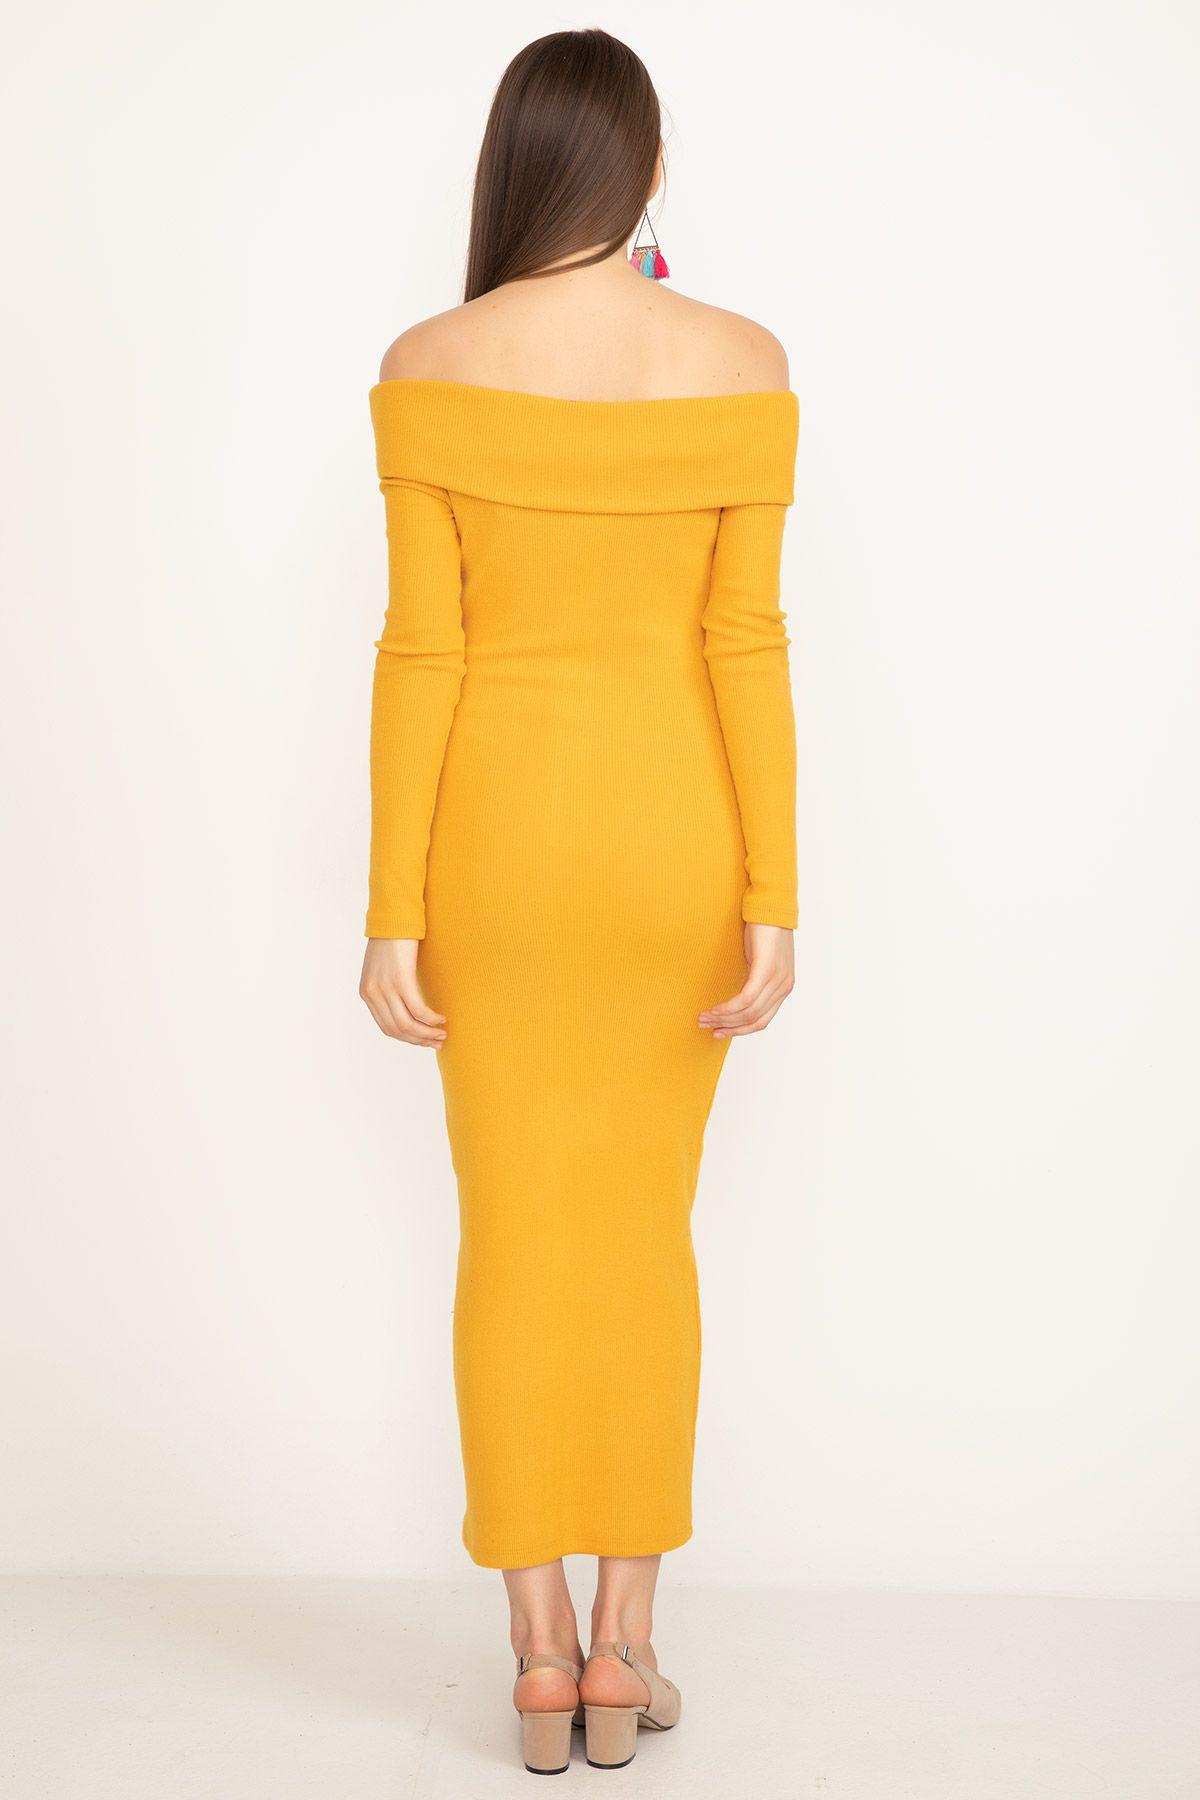 Dresses-Mustard